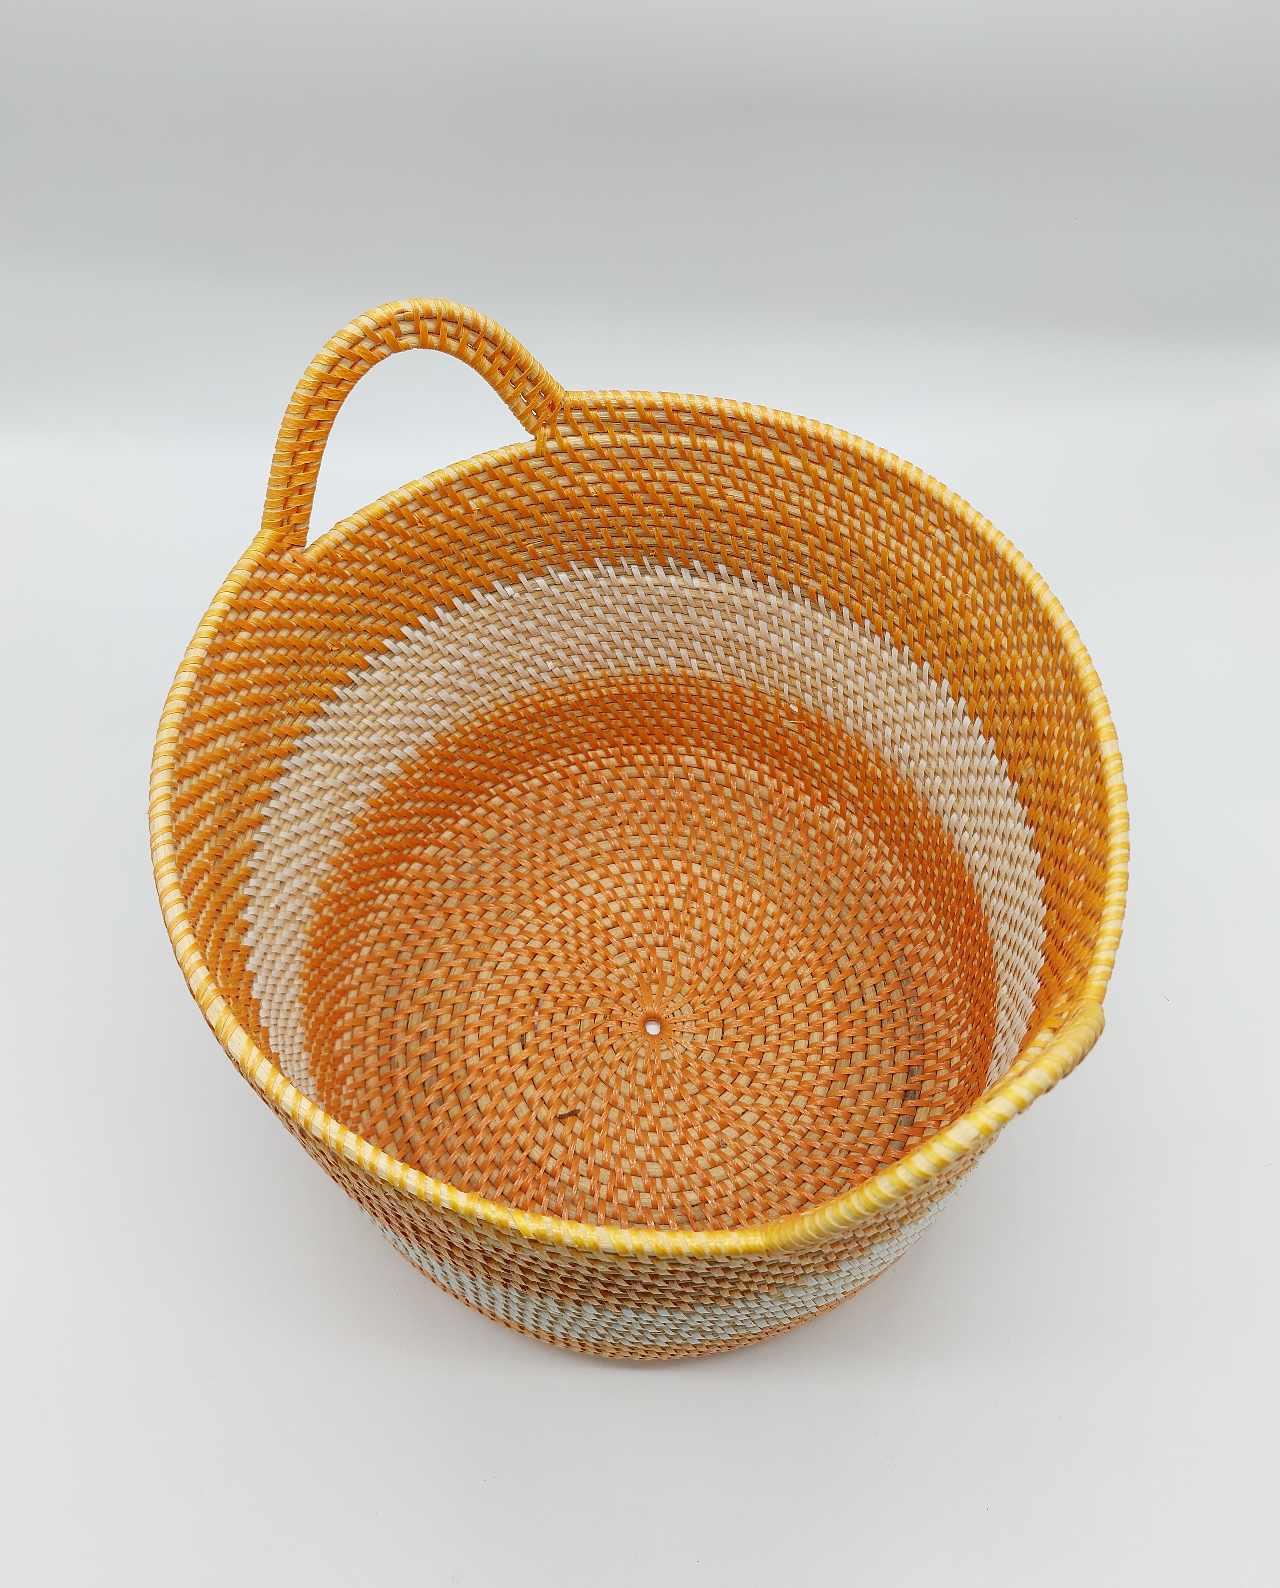 Basket Rattan White Orange Diameter 31 cm